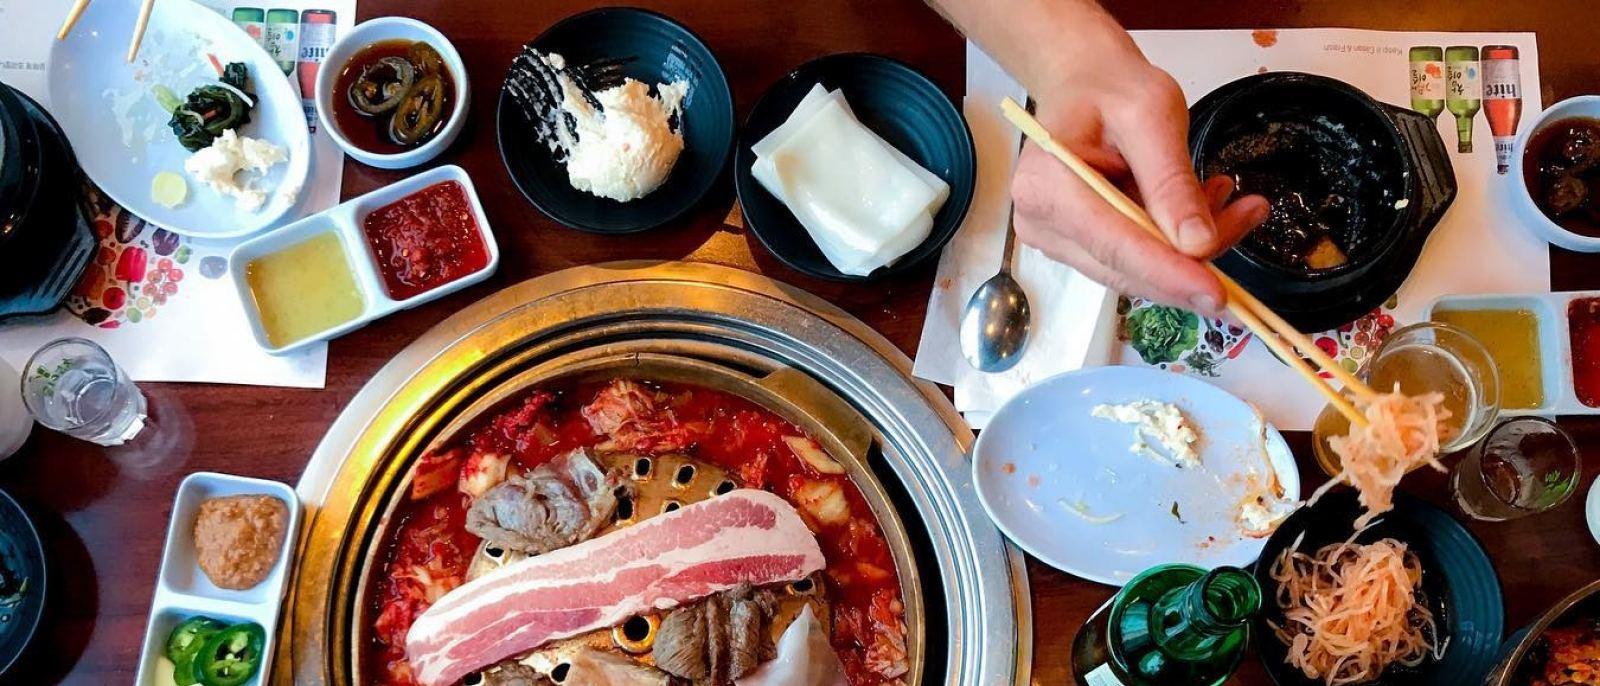 Yang San Bak in Koreatown | Photo: @michiiielliott, Instagram